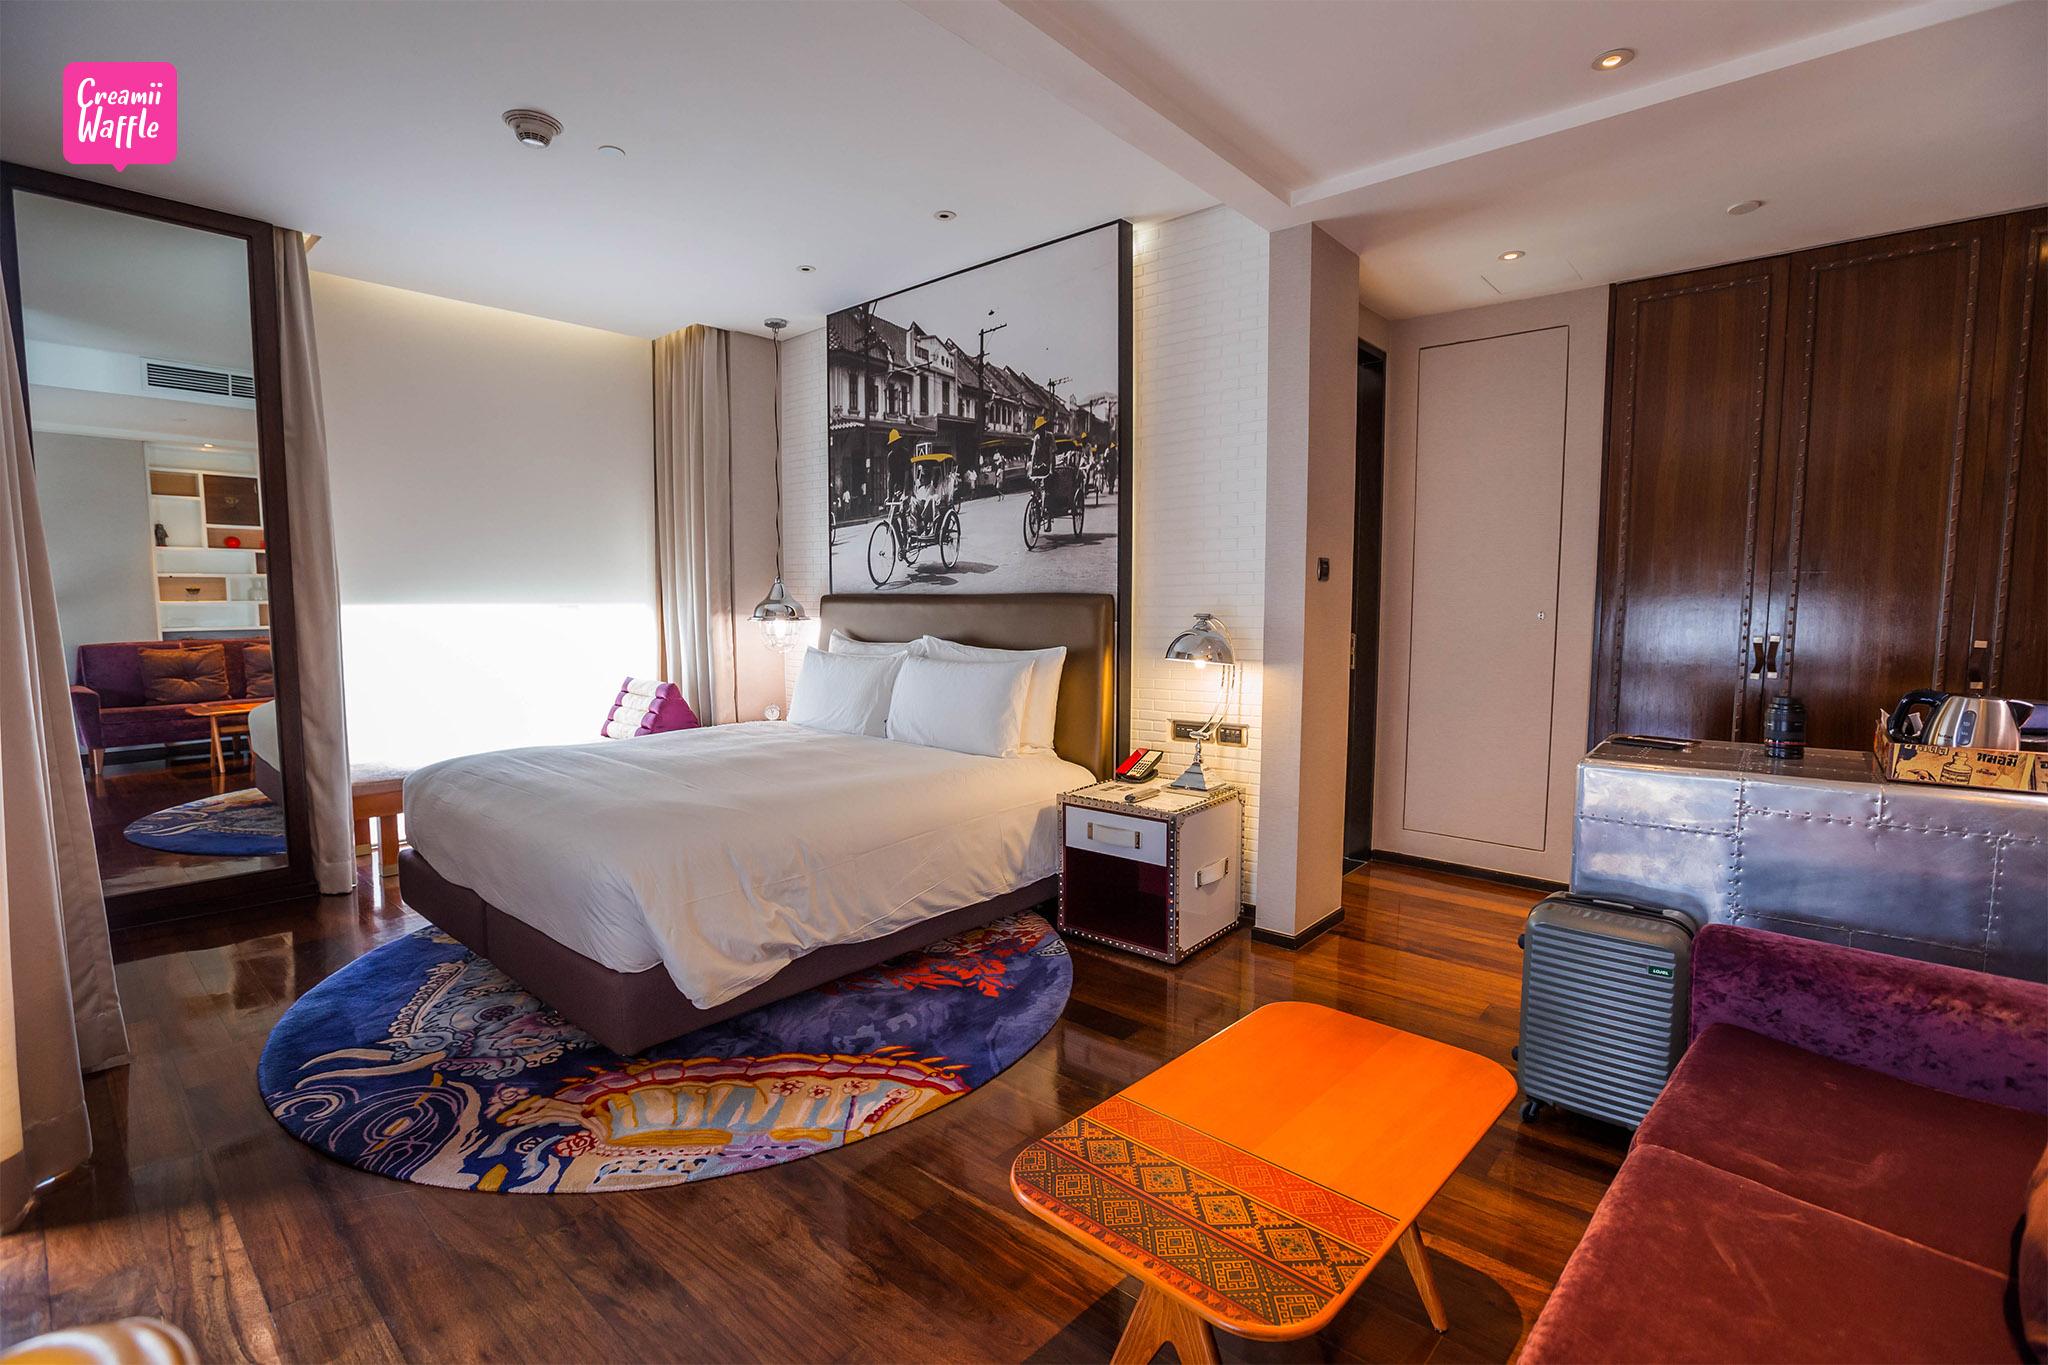 Hotel indigobkk รีวิวโปรโมชั่น โรงแรม อินดิโก ถนนวิทยุ กรุงเทพฯ